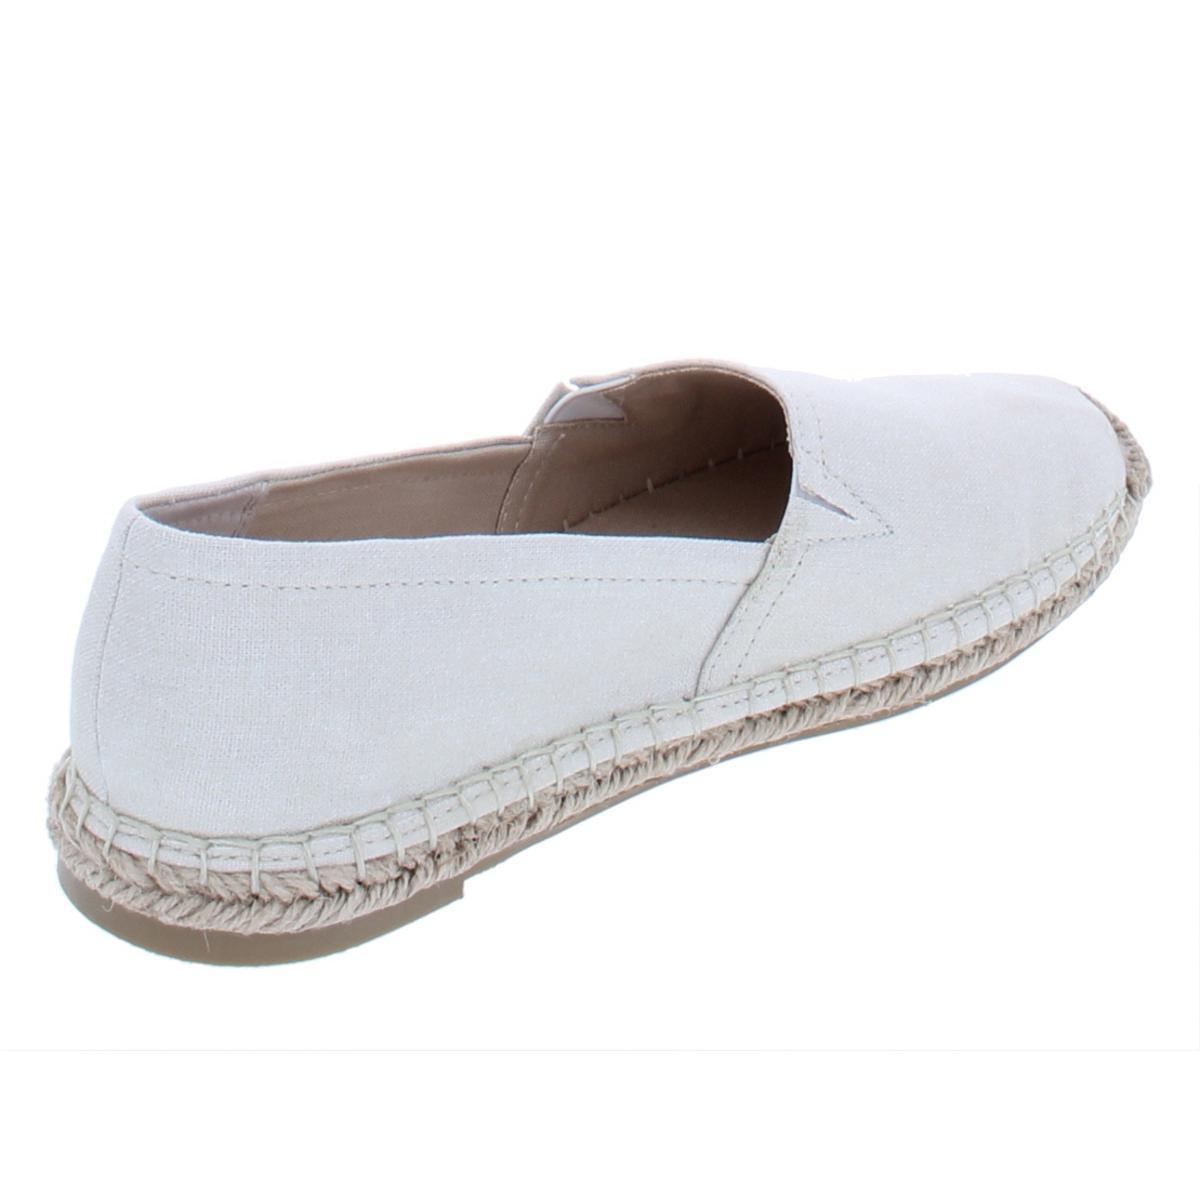 Seven-Dials-Womens-Hildie-Metallic-Loafers-Slip-On-Espadrilles-Flats-BHFO-9702 thumbnail 6